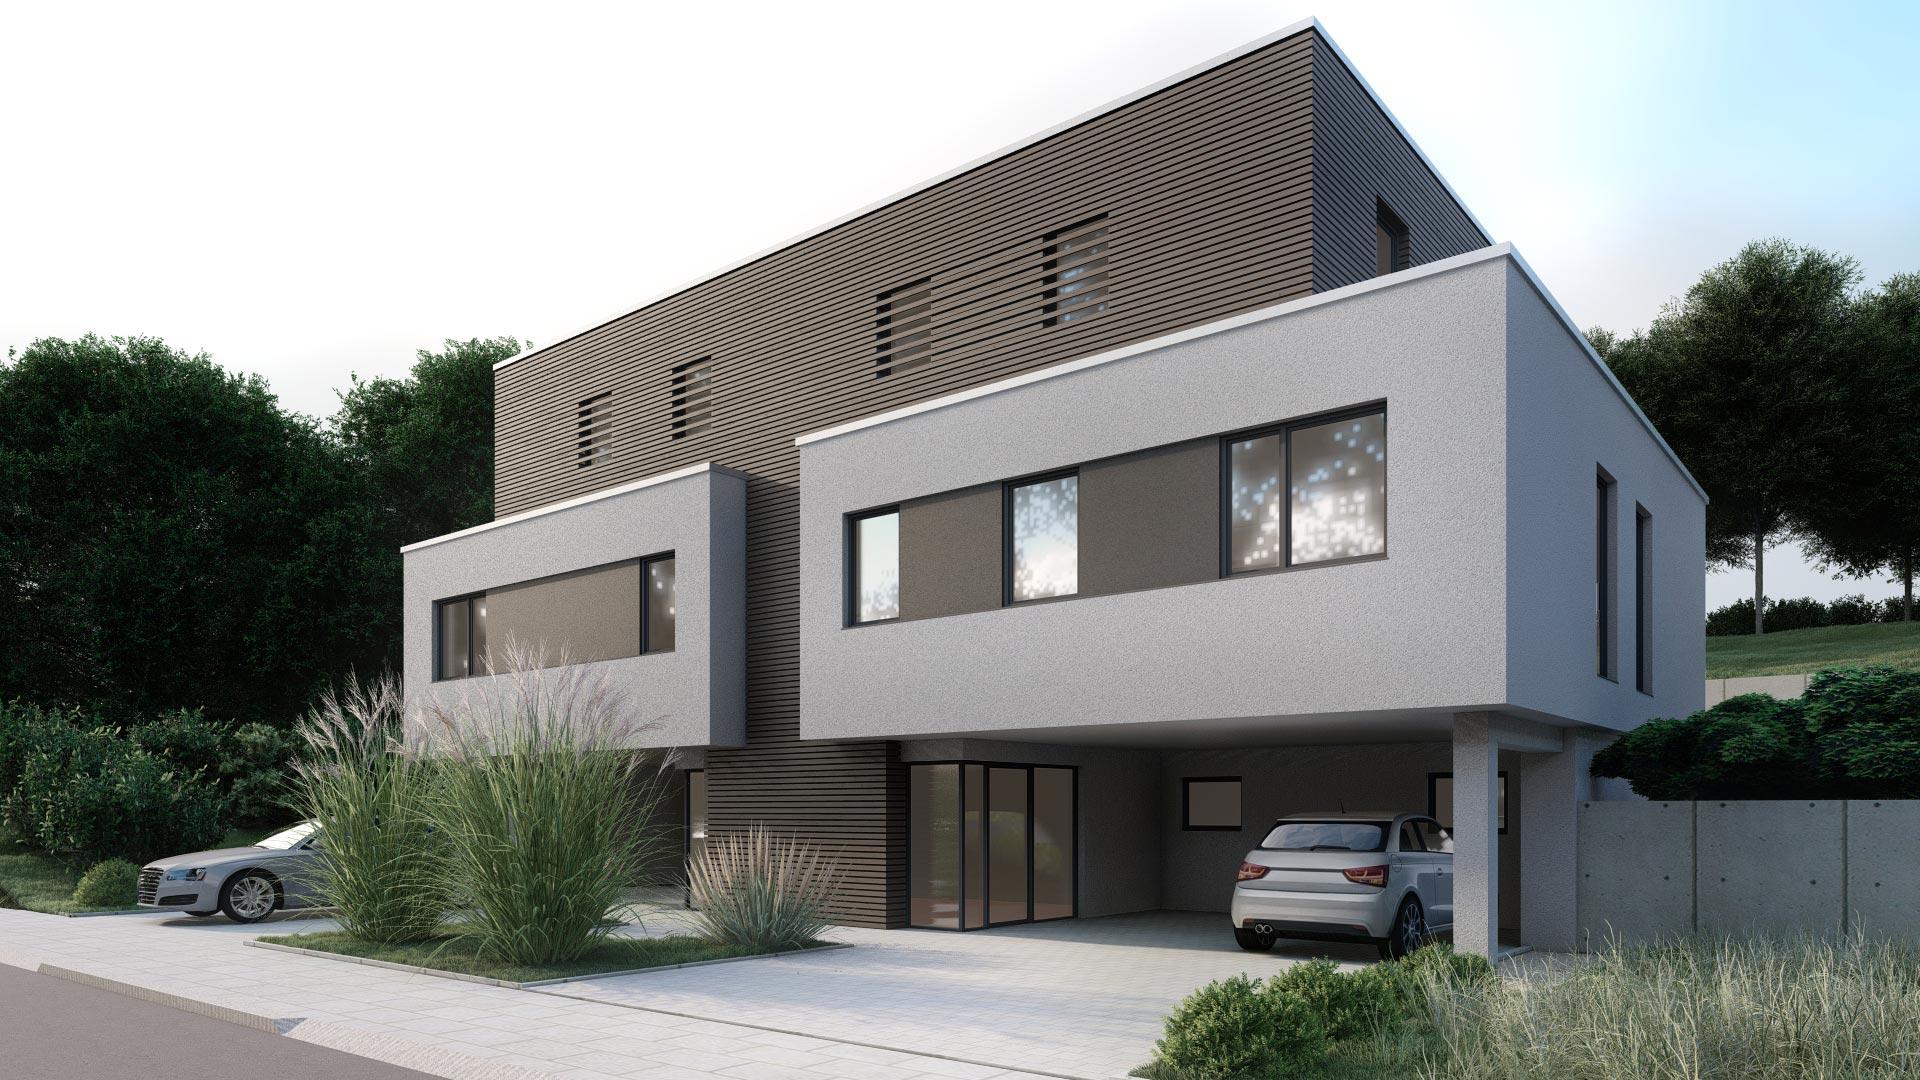 Zweifamilienhaus Bad Driburg